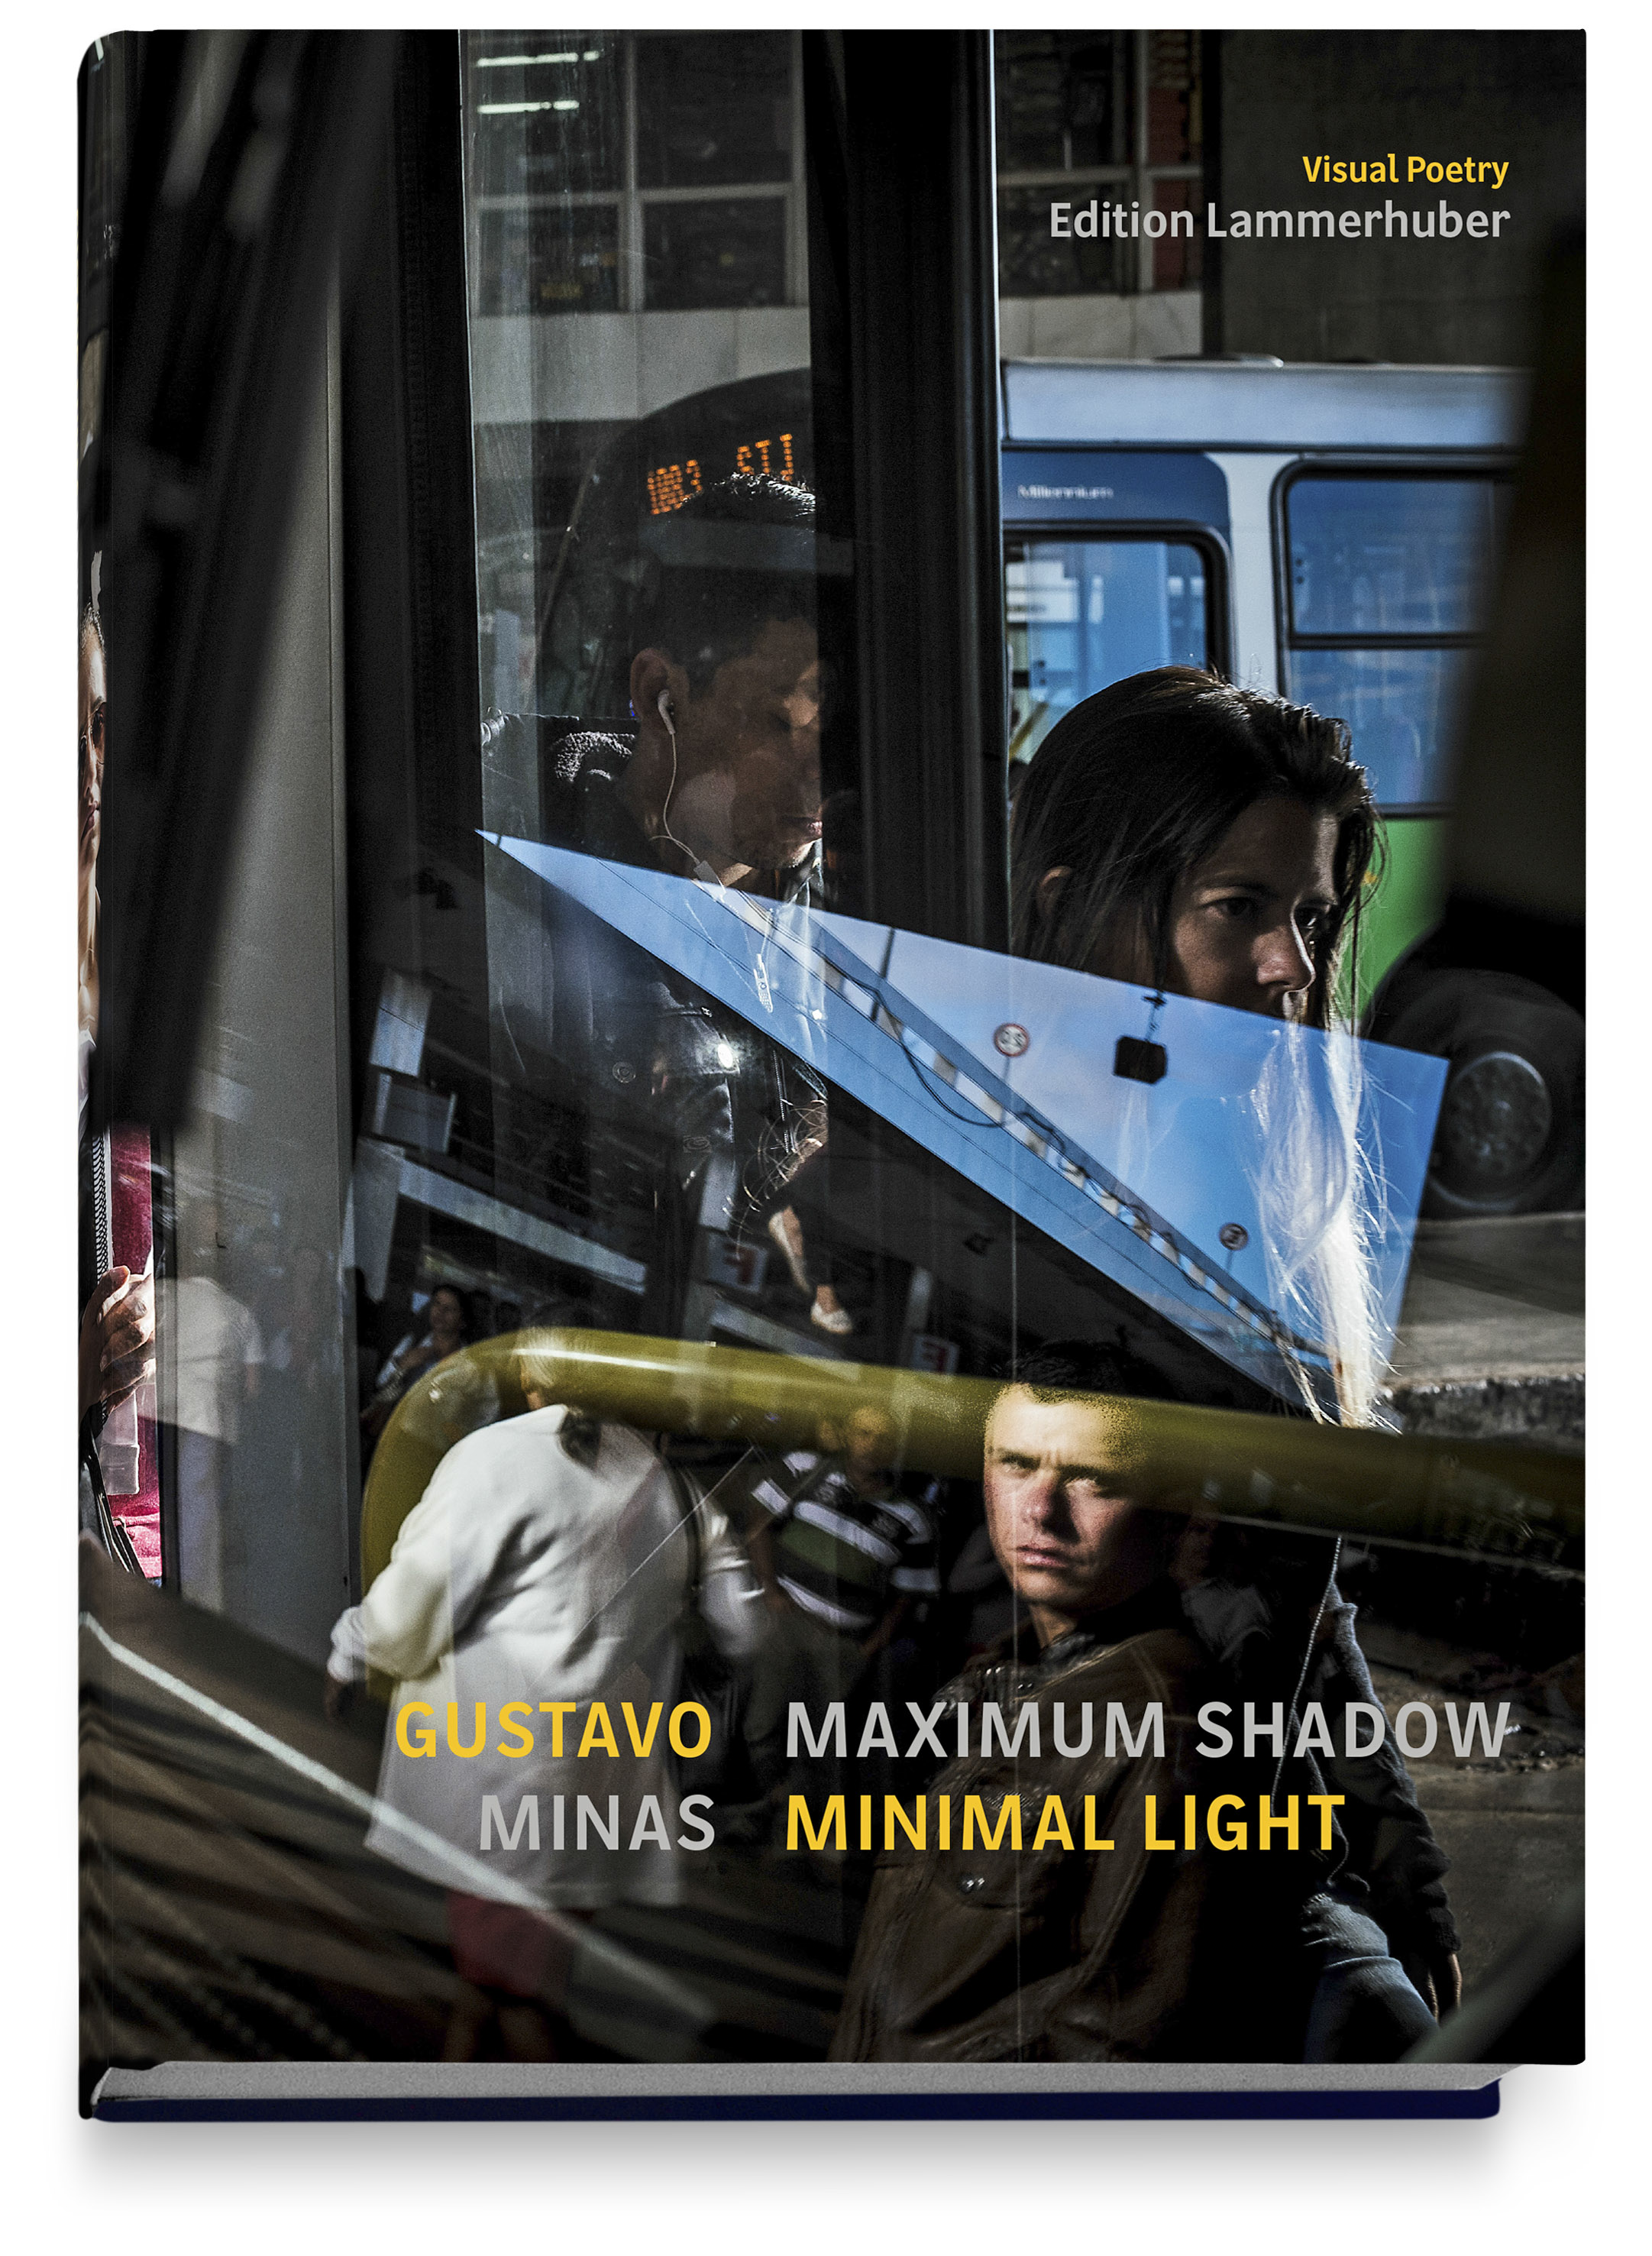 01_gustavo_minas_maximum_shadow_minimal_light.jpg